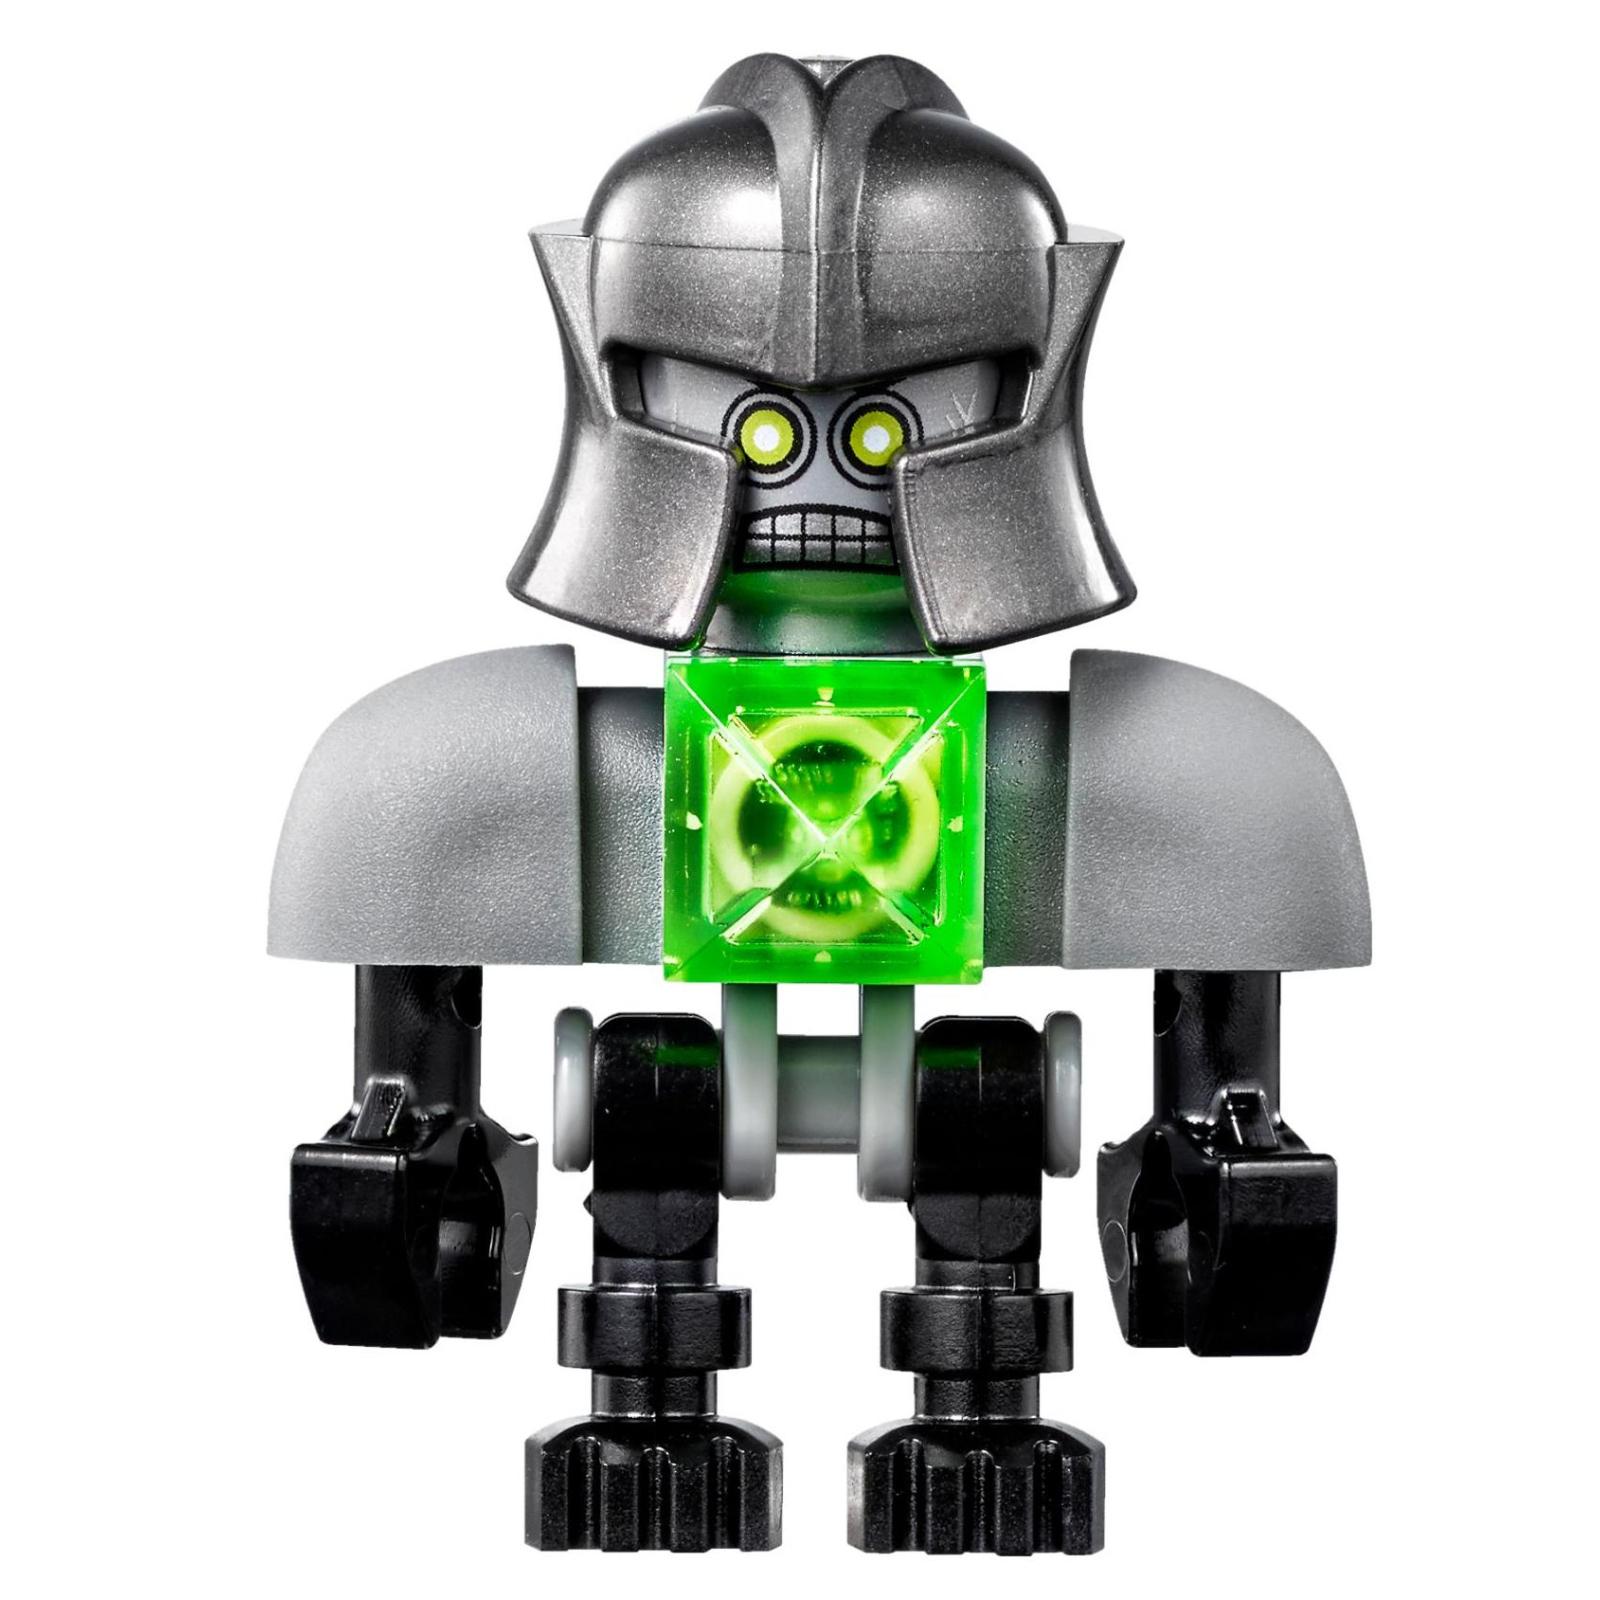 Конструктор LEGO Nexo Knights Бой техномагов (72004) изображение 8